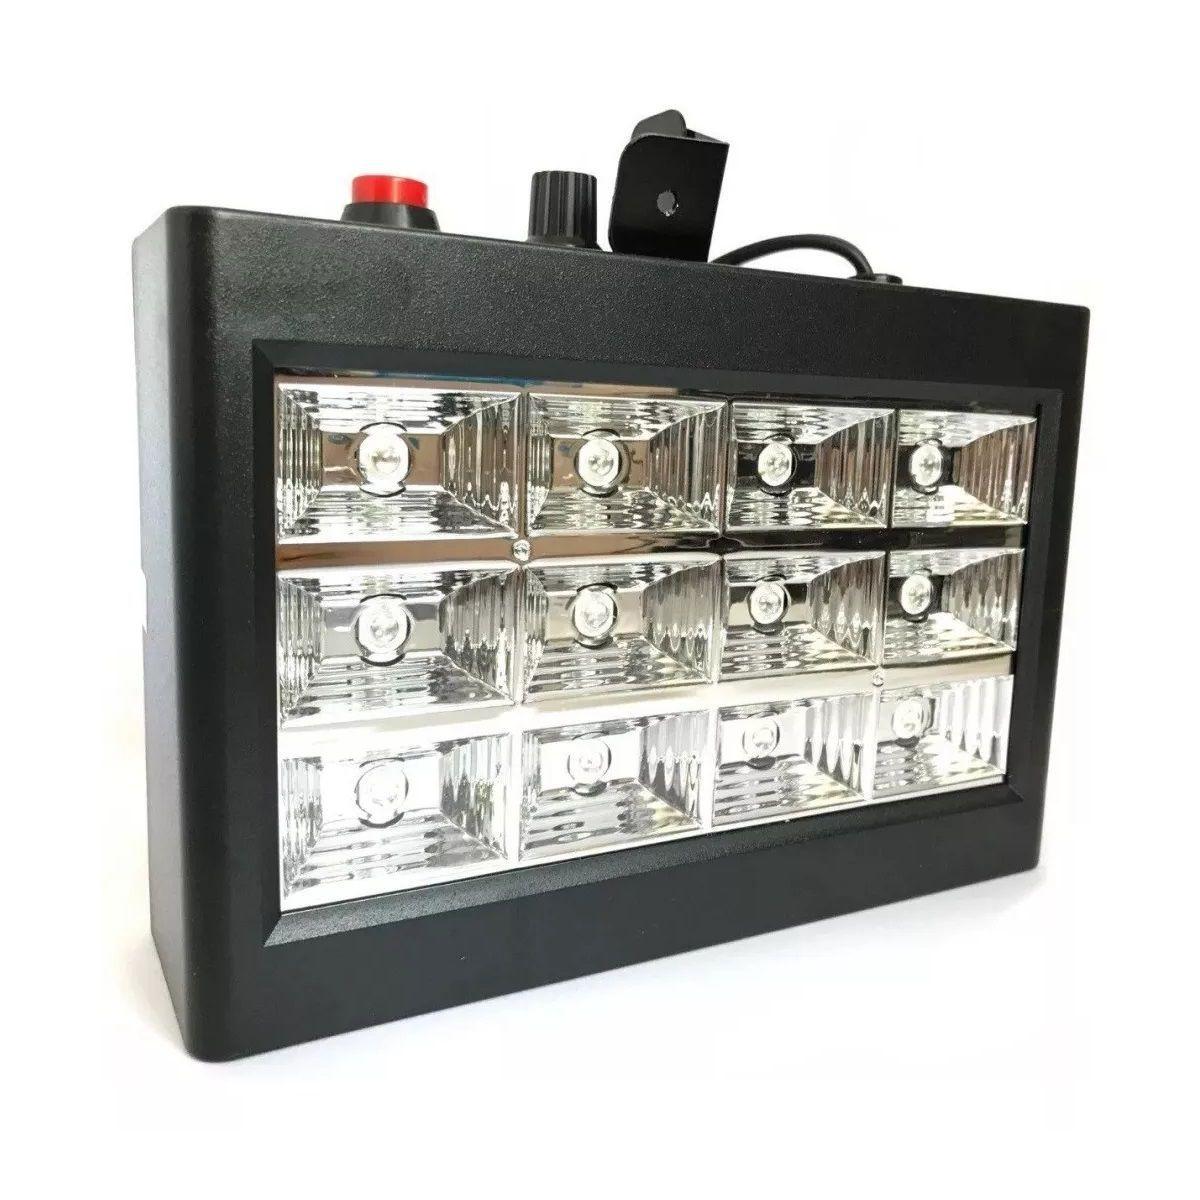 Kit Canhão Luz 18 Leds RGB + Strobo 12 Leds RGB + Máquina Fumaça 600W - 18LEDSLIM+12LEDRGBR+XH-600W